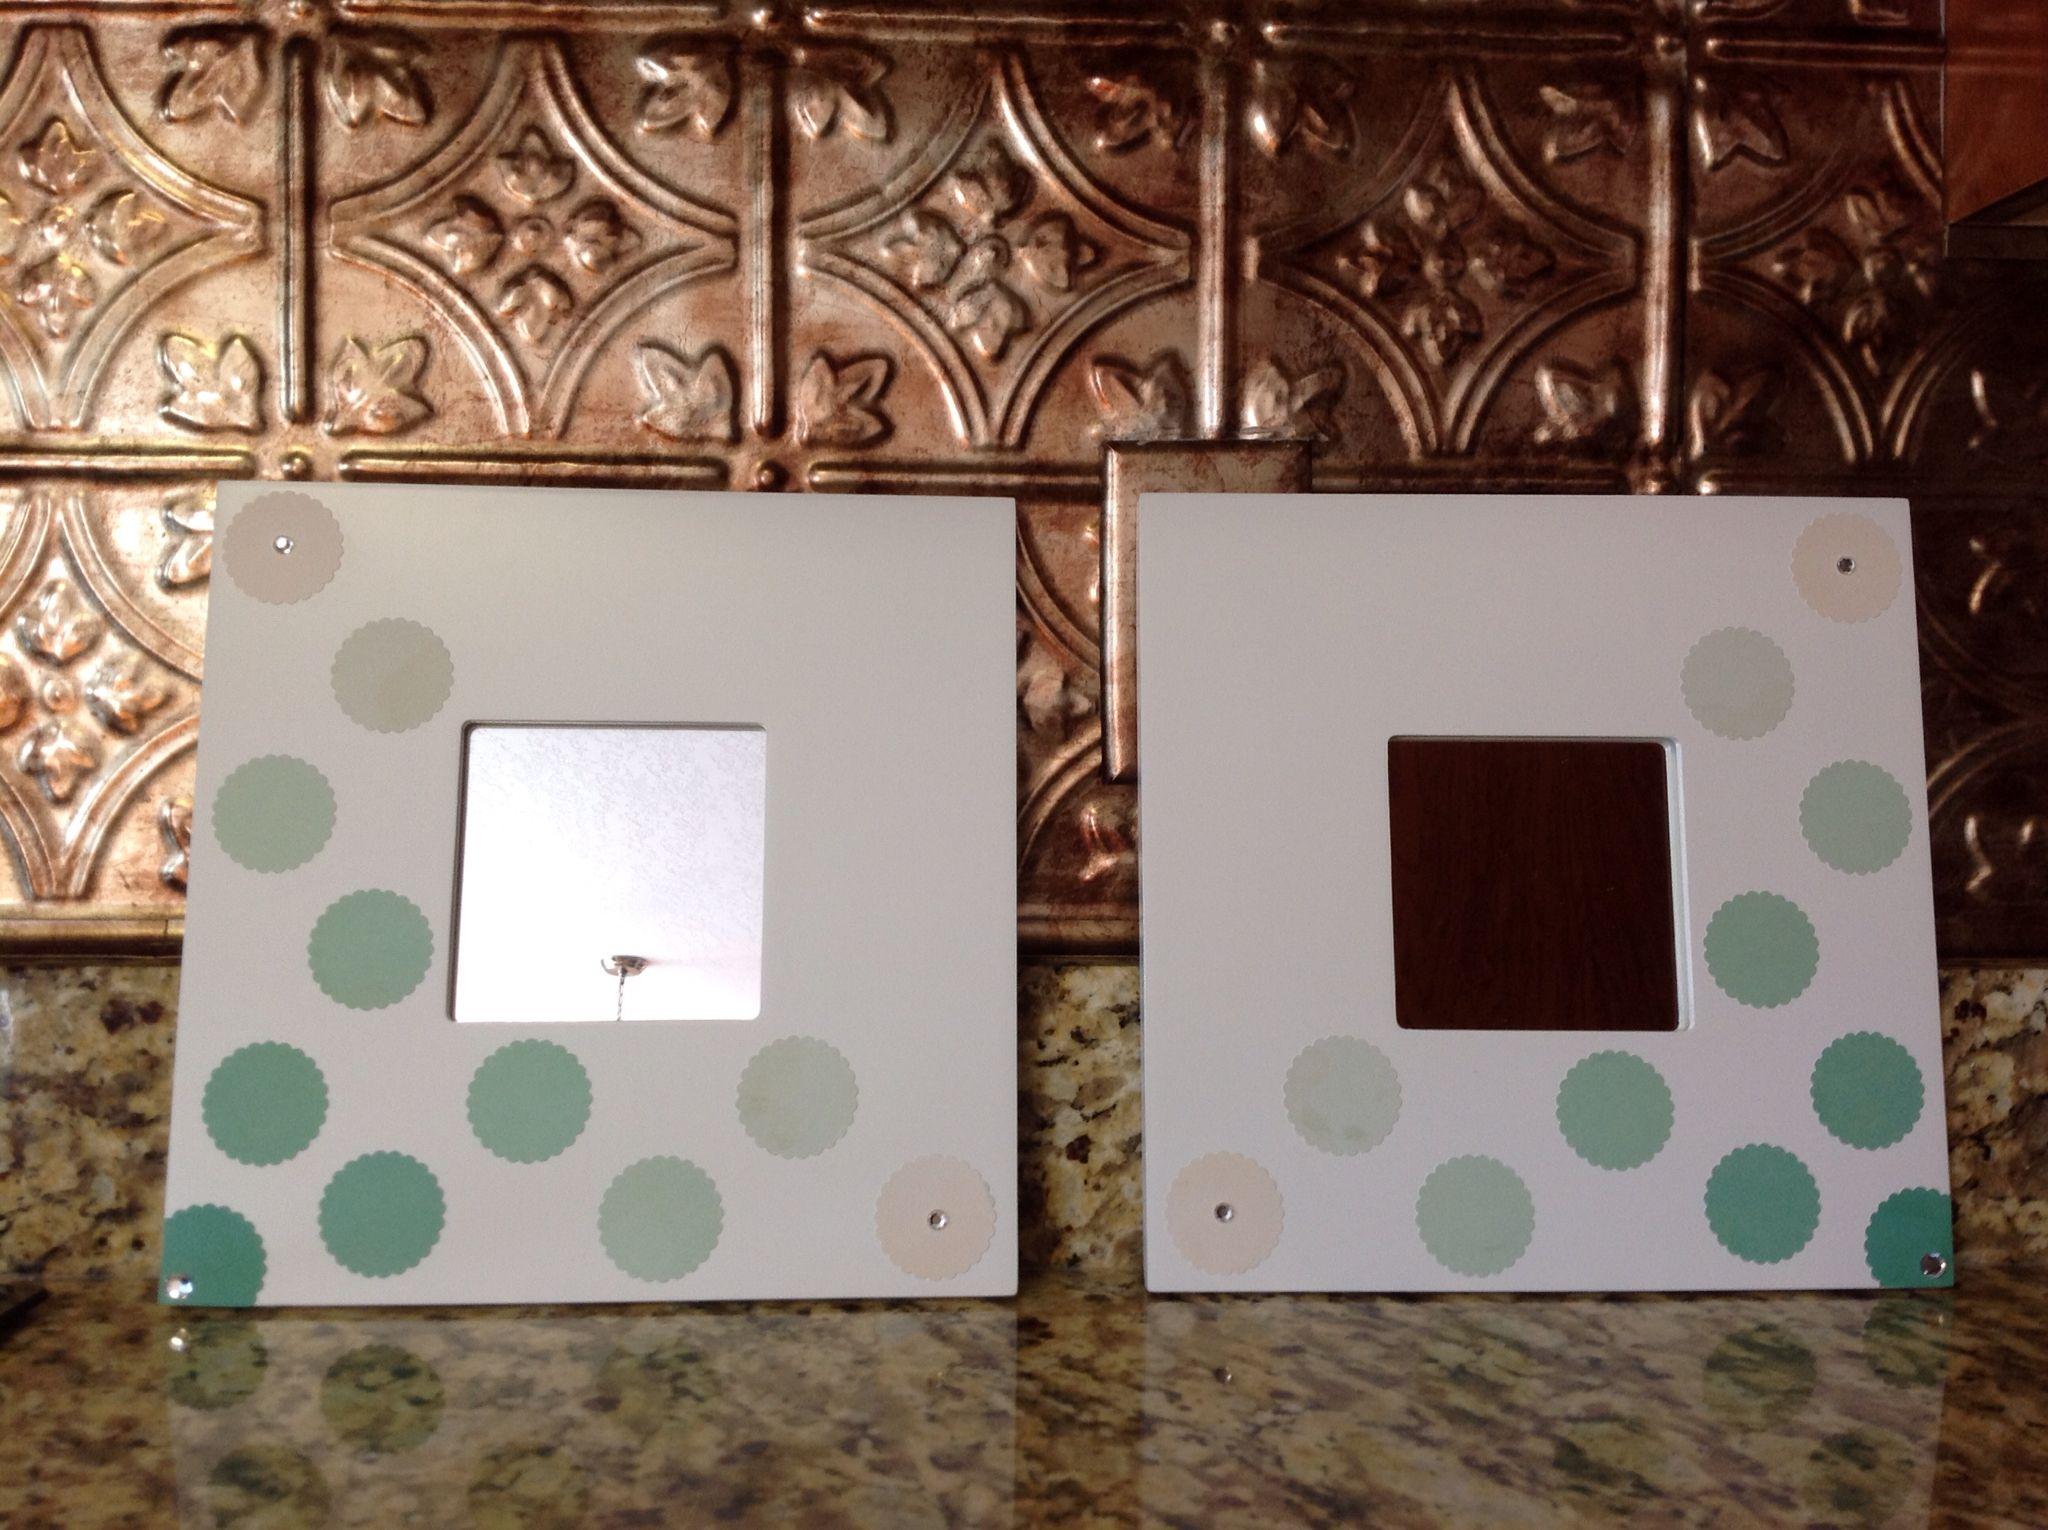 Scrapbook paper art ideas - Ikea Malma Mirrors Decorated With Scrapbook Paper Cutouts